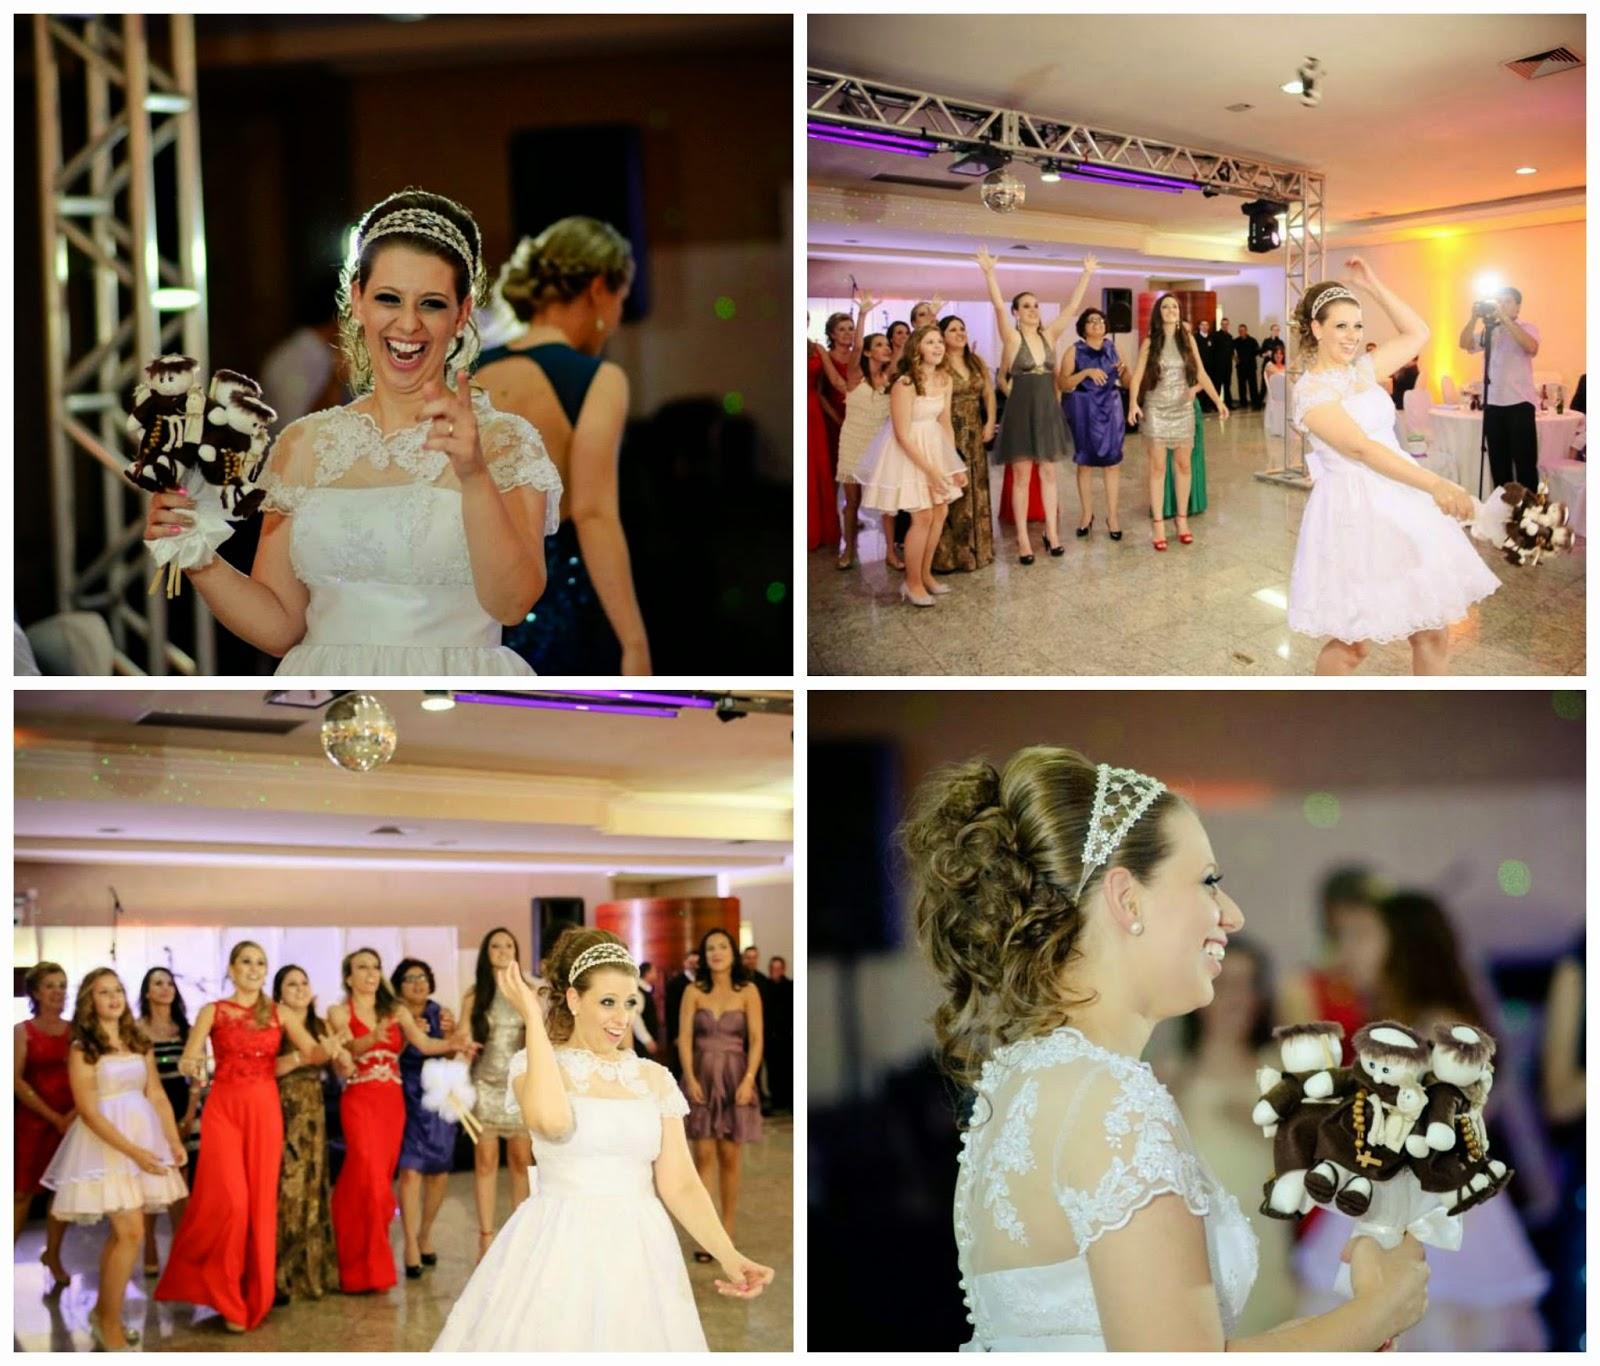 festa-noiva-bouquet-solteiras-santo-antonio